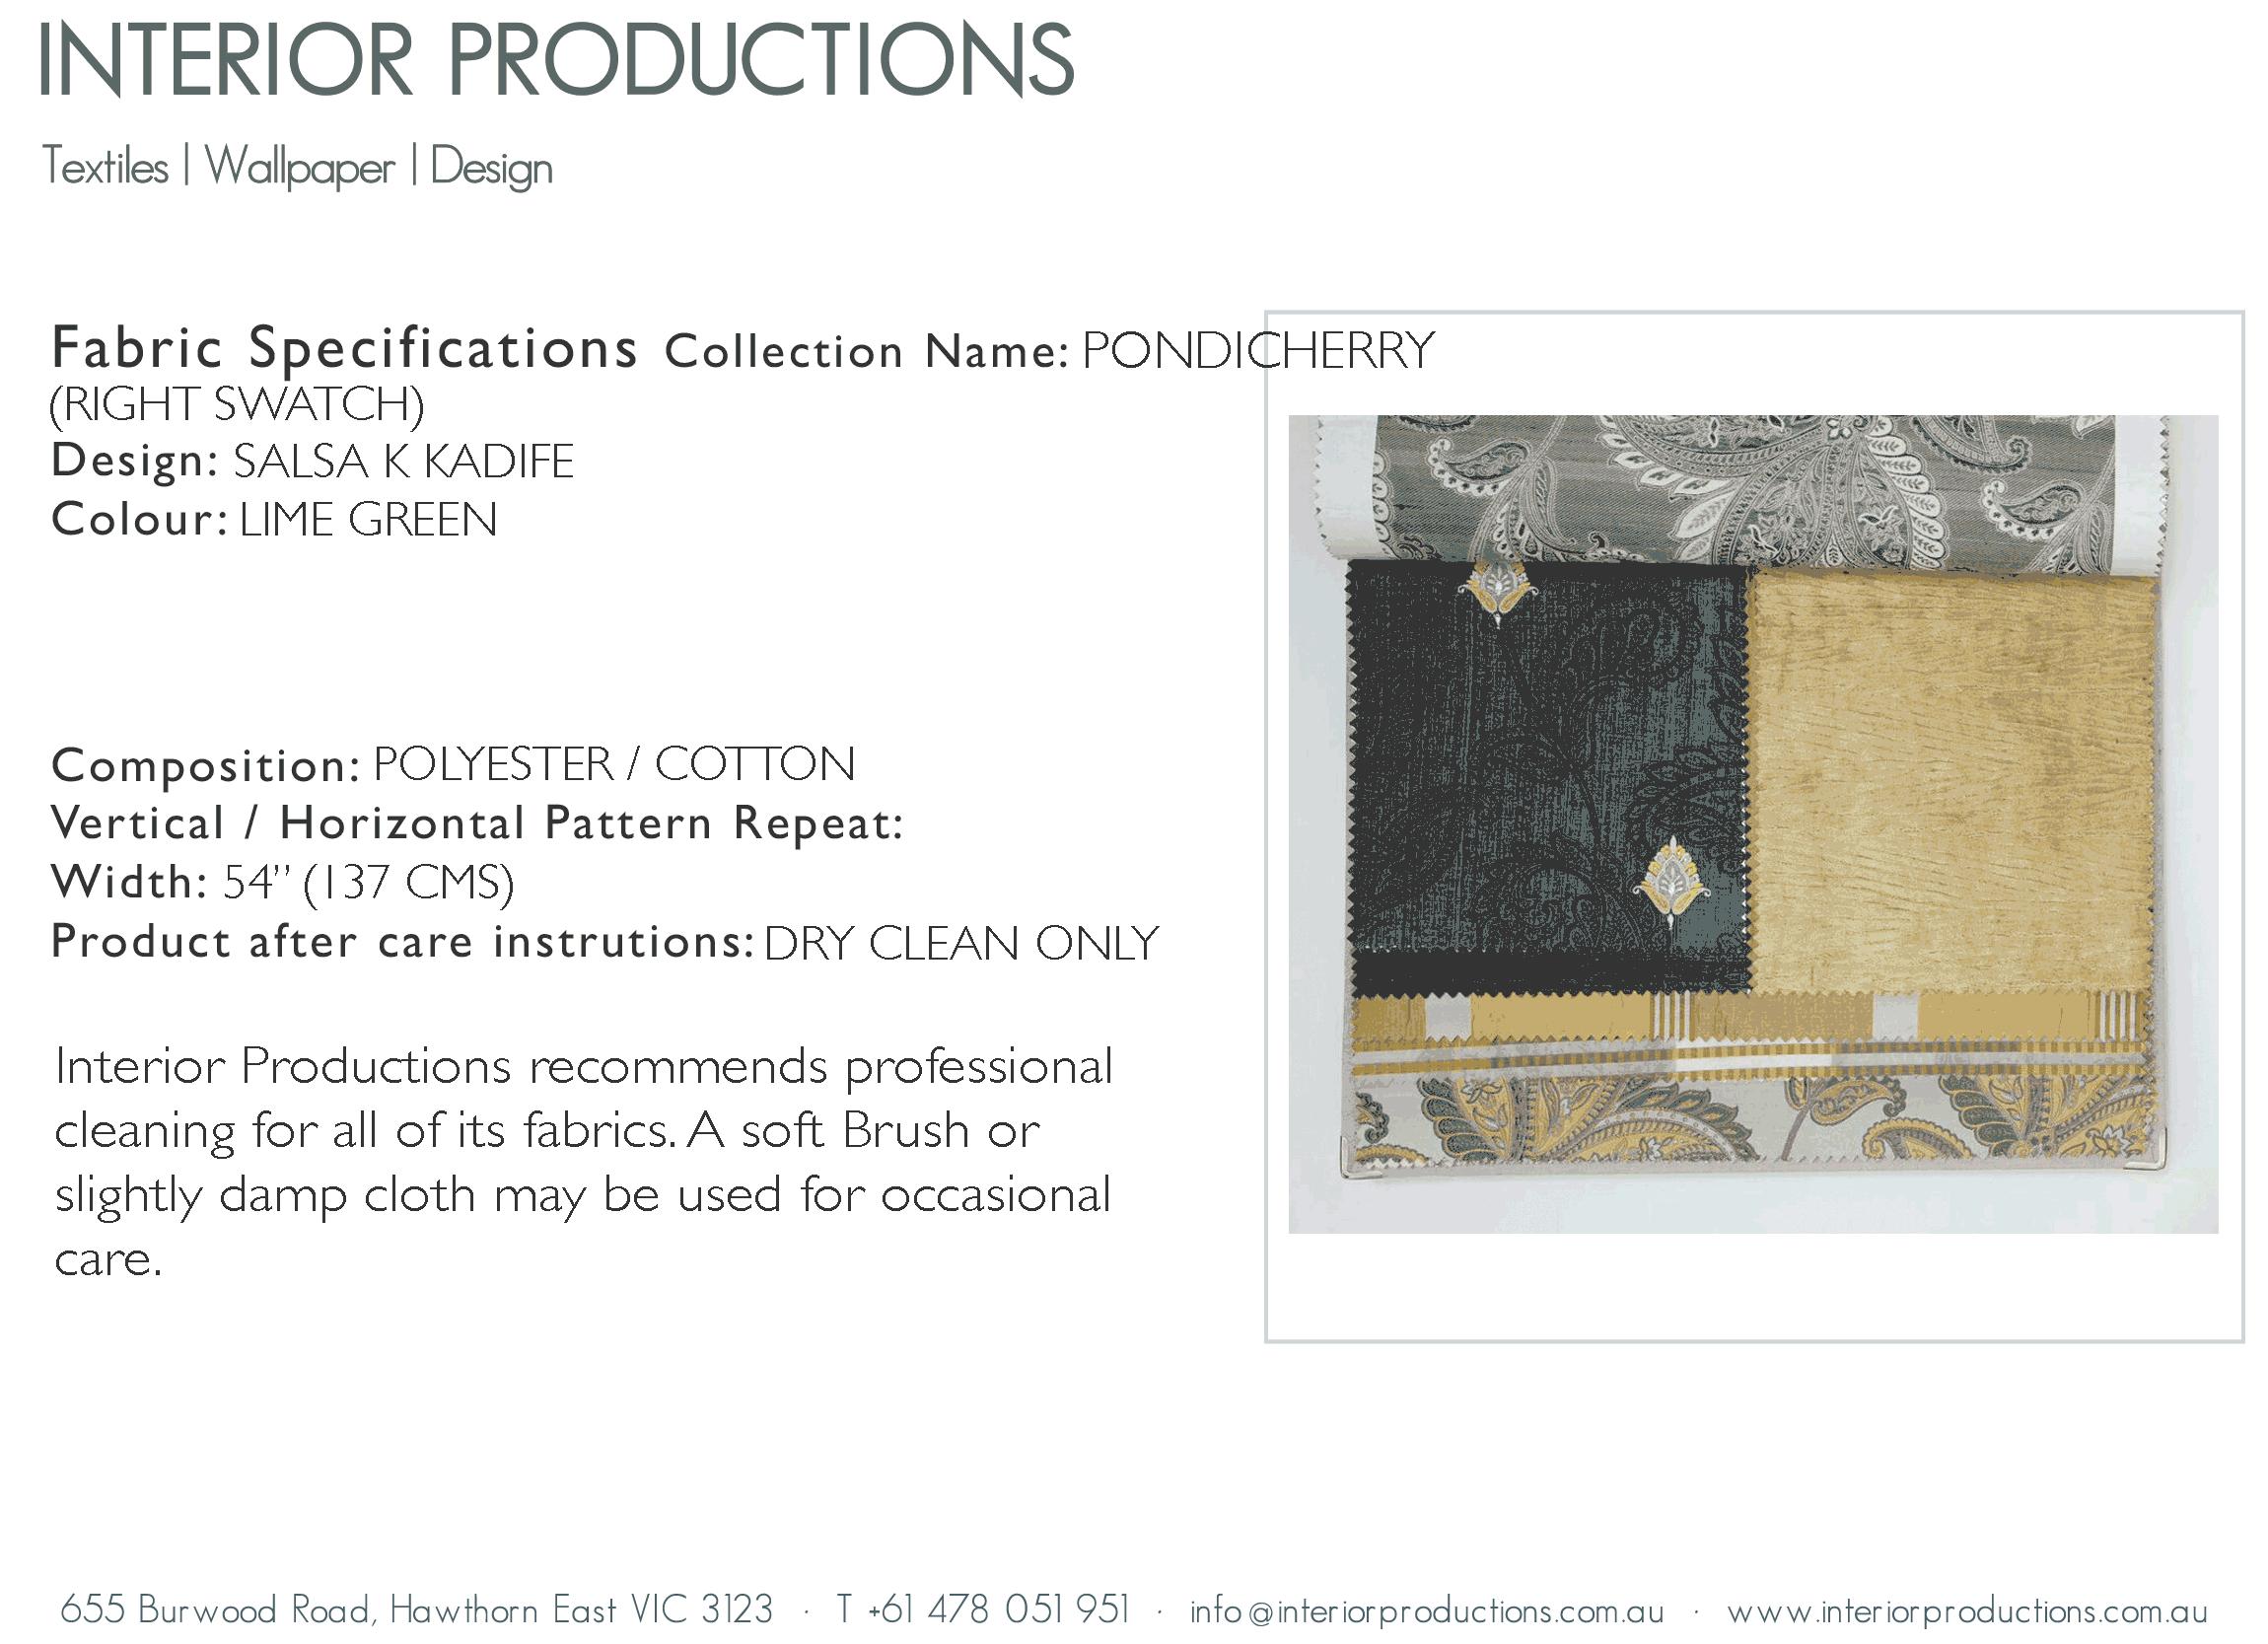 interior_productions_SALSA-K-KADIFE---LIME-GREEN